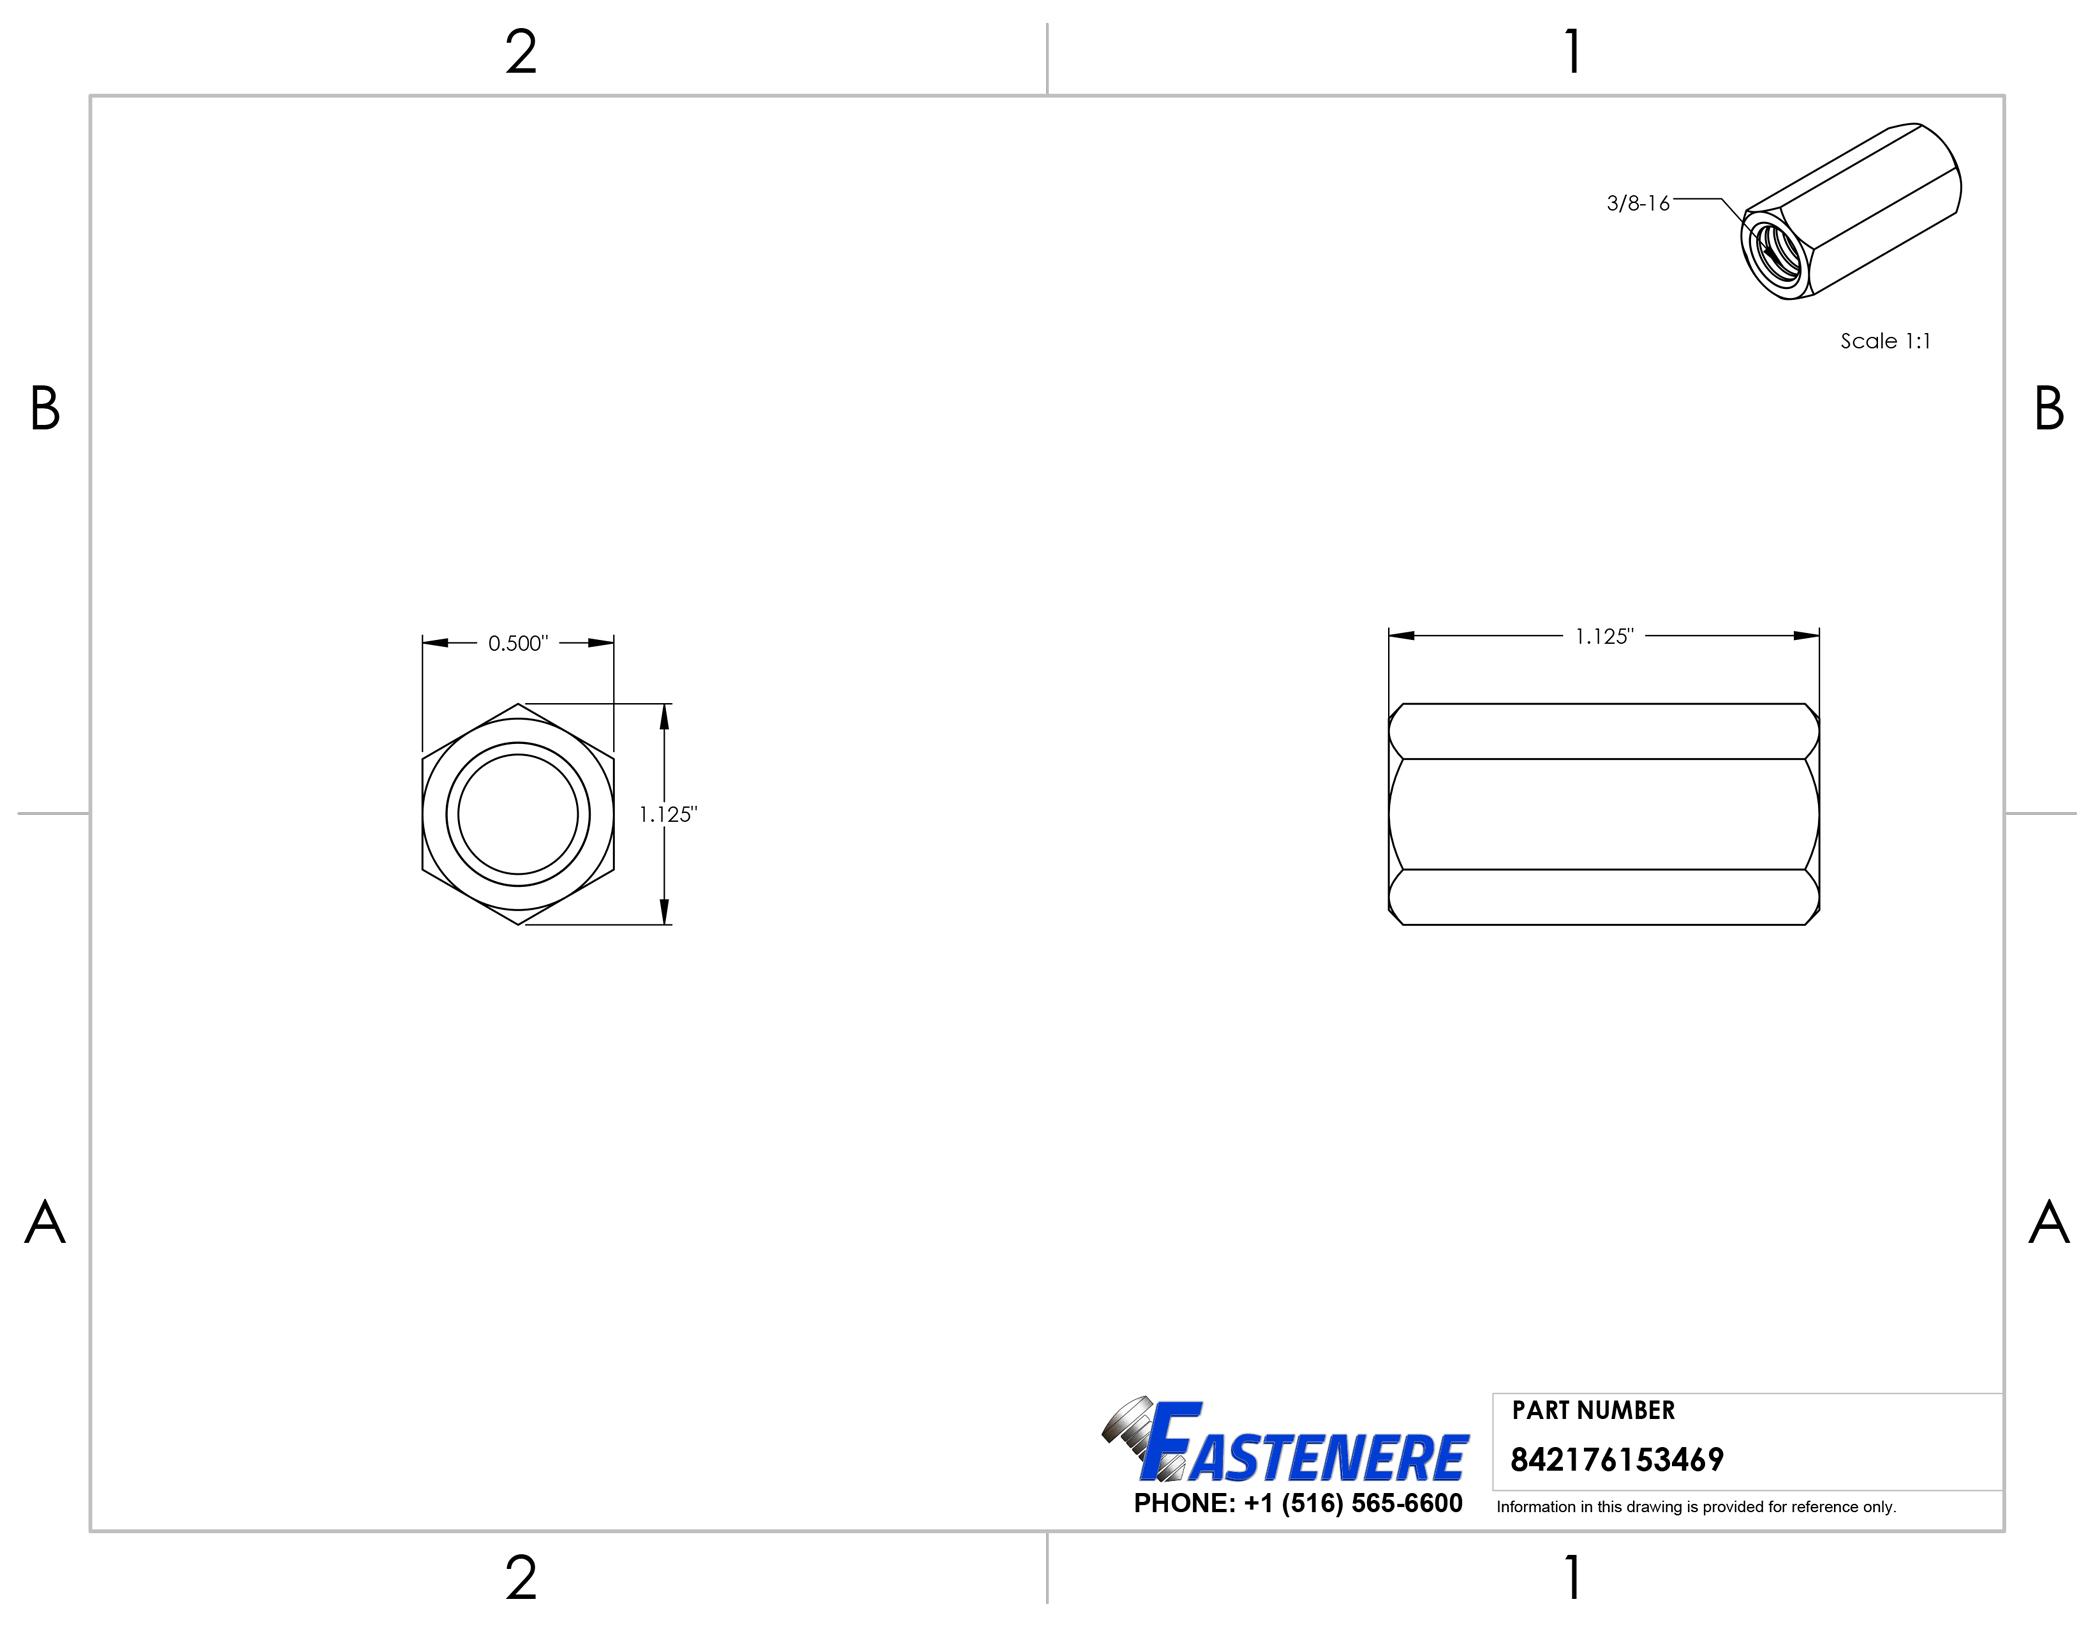 GS-600I Edelstahl I-Form Garderobenstange Kleiderstange Rundrohr 33,7x2 mm